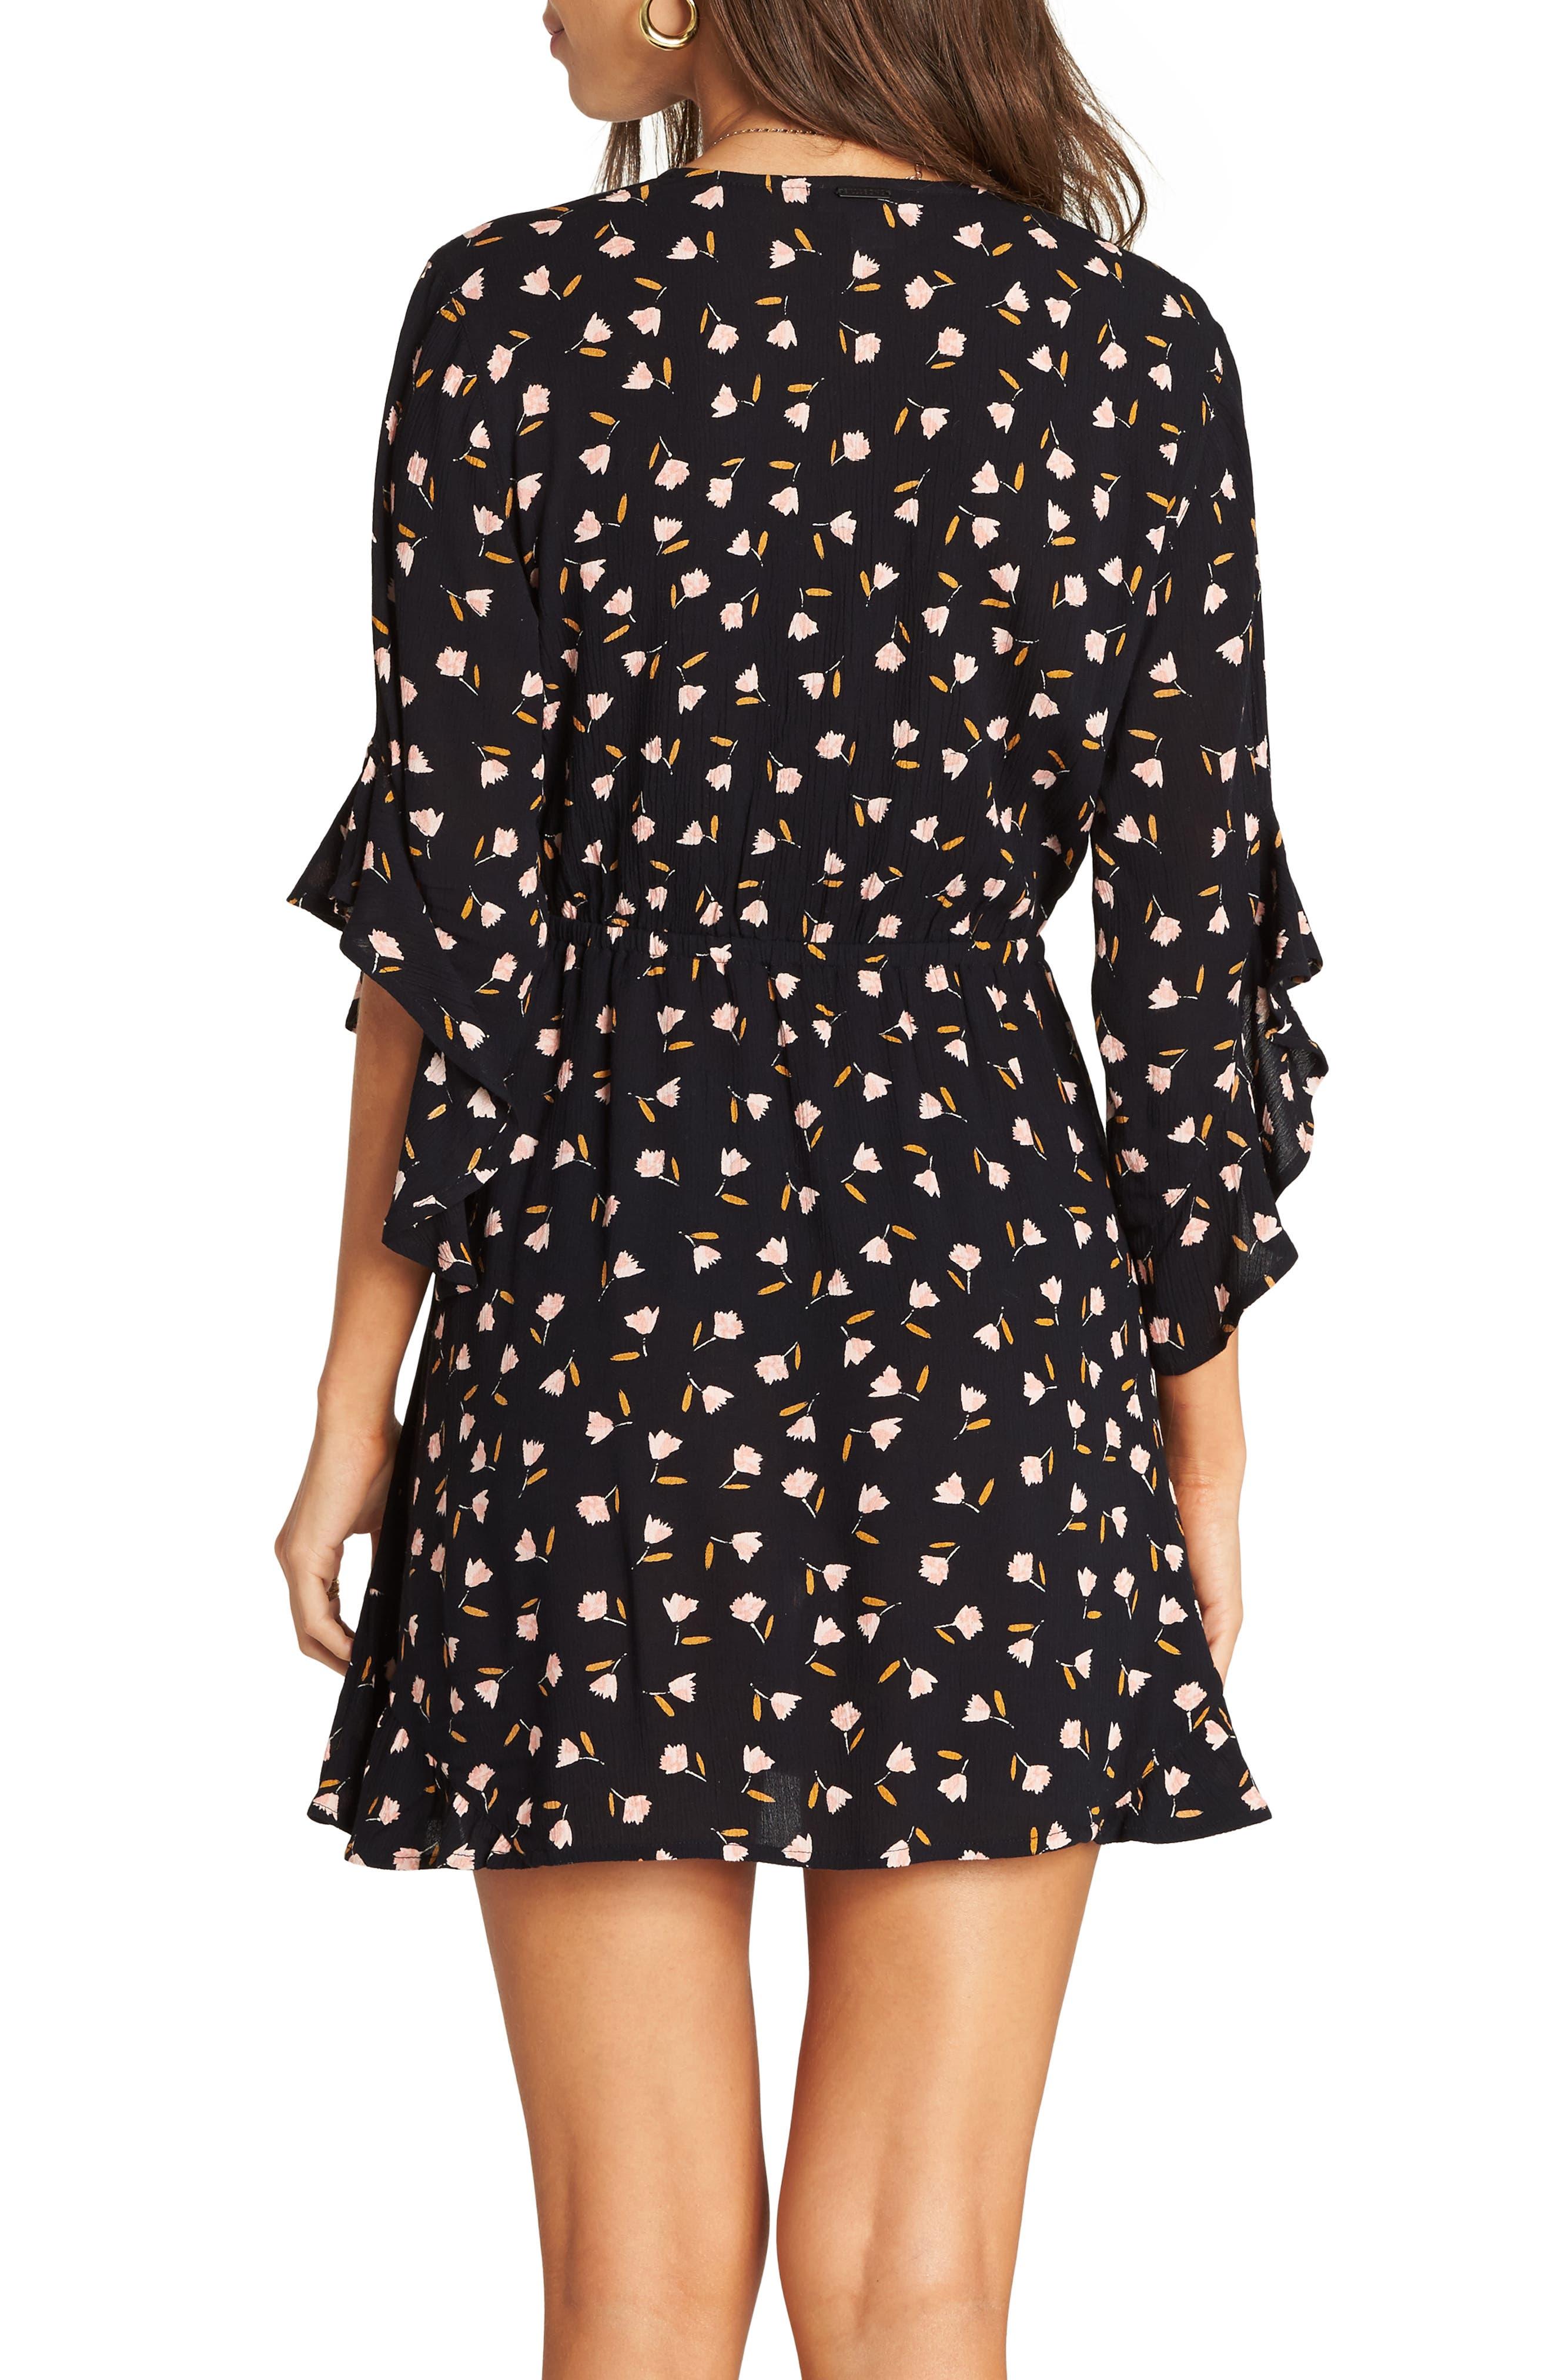 BILLABONG,                             Love Light Floral Print Dress,                             Alternate thumbnail 2, color,                             001